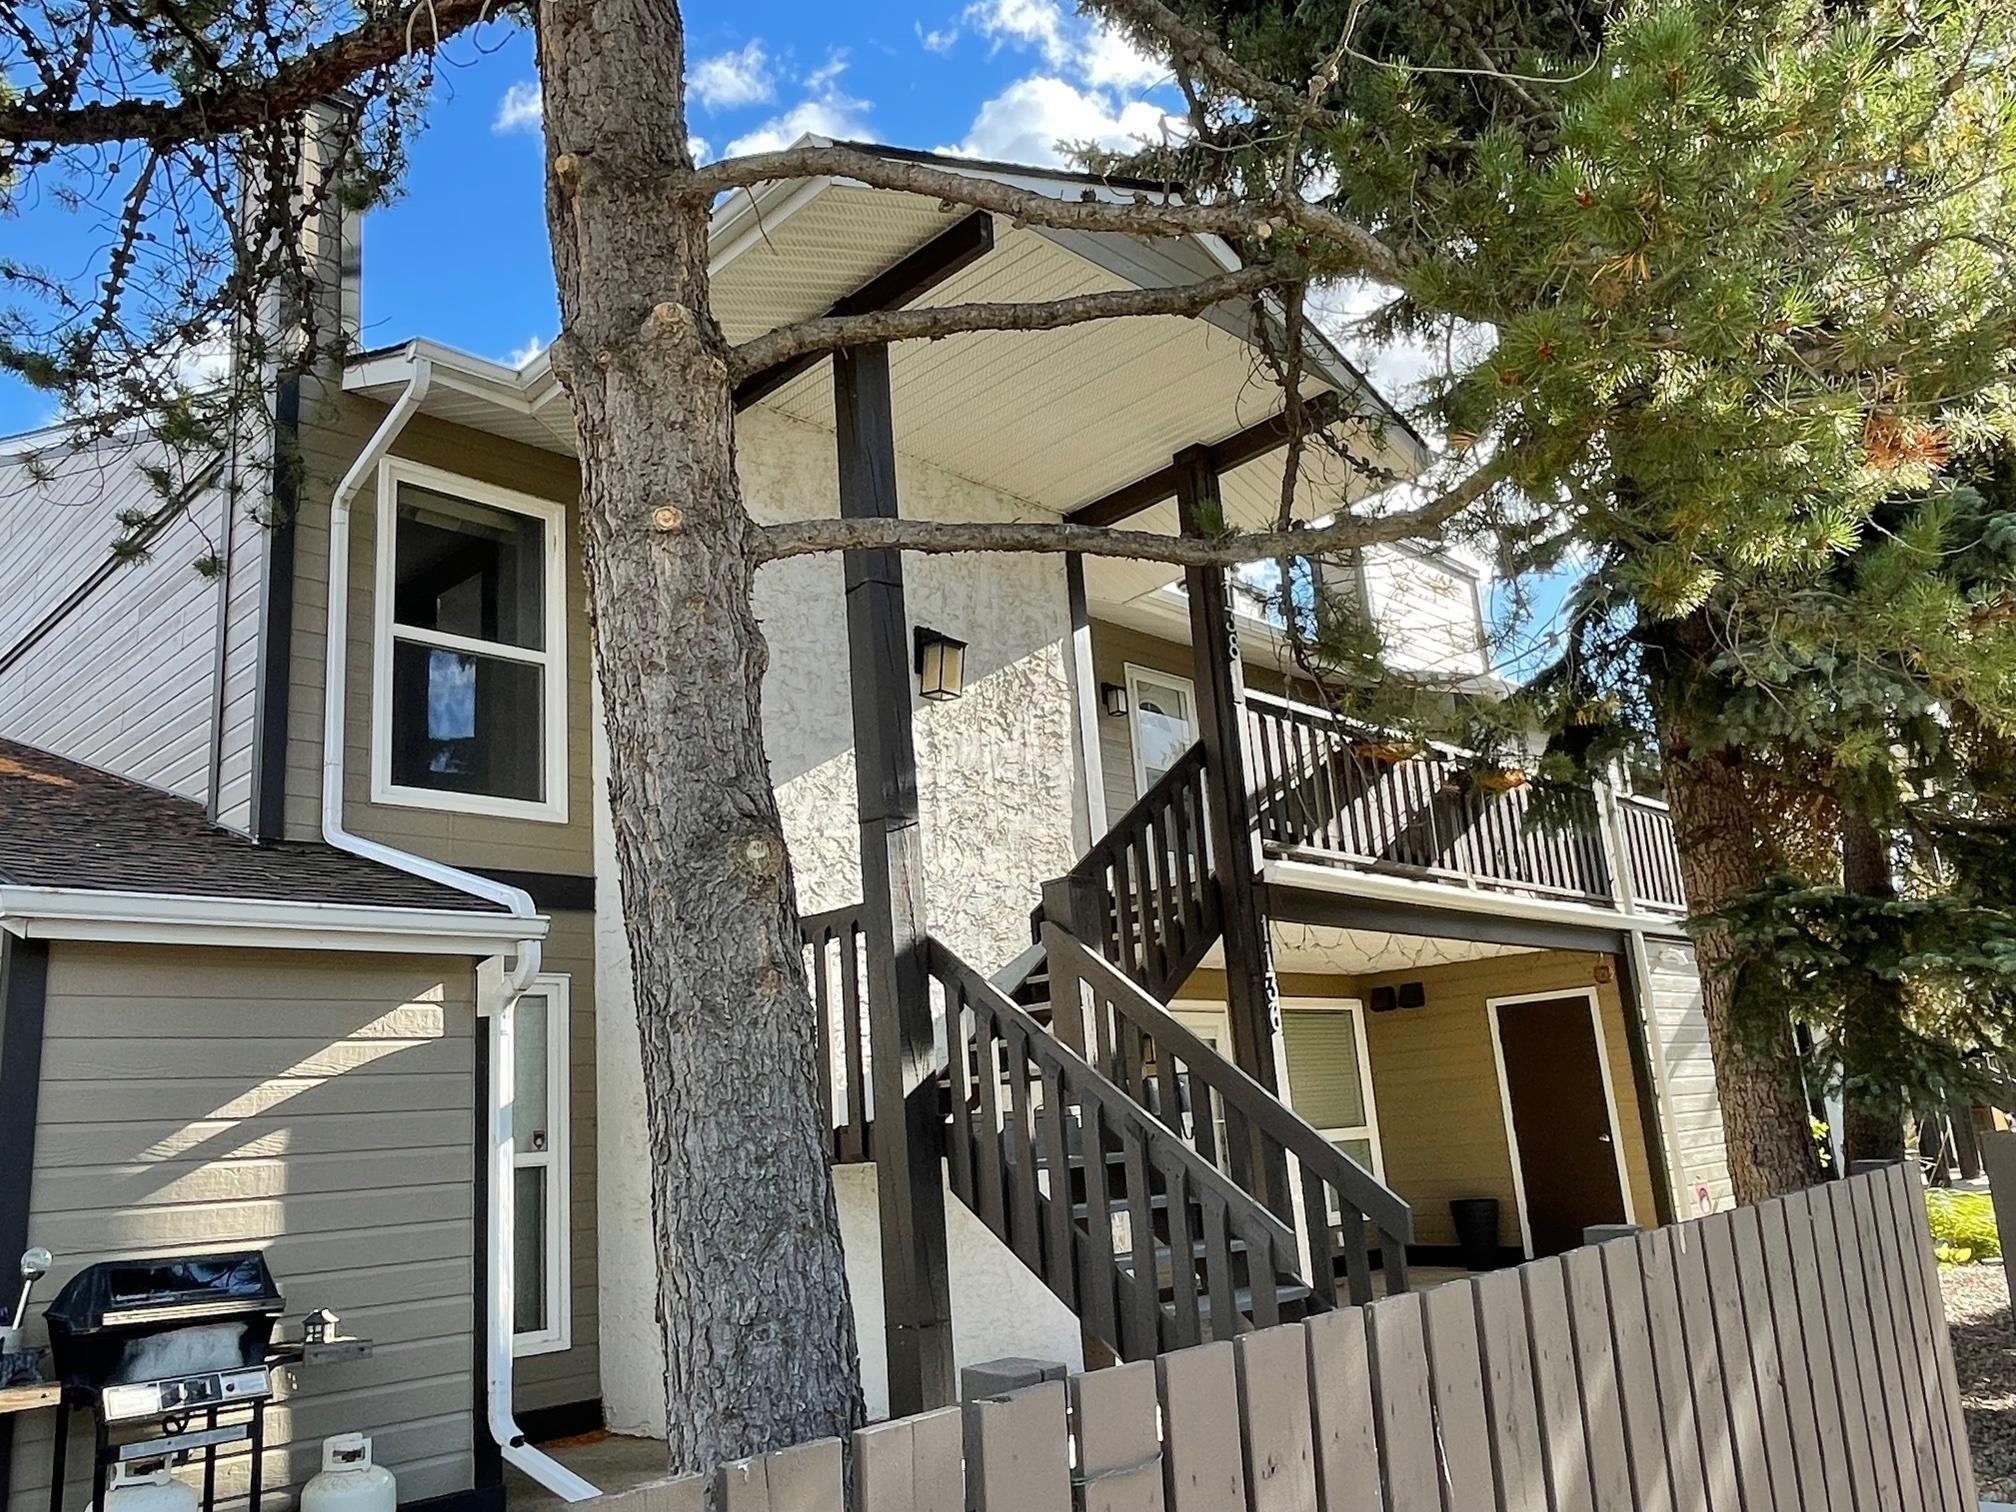 Main Photo: 1138 SADDLEBACK Road in Edmonton: Zone 16 Carriage for sale : MLS®# E4263349